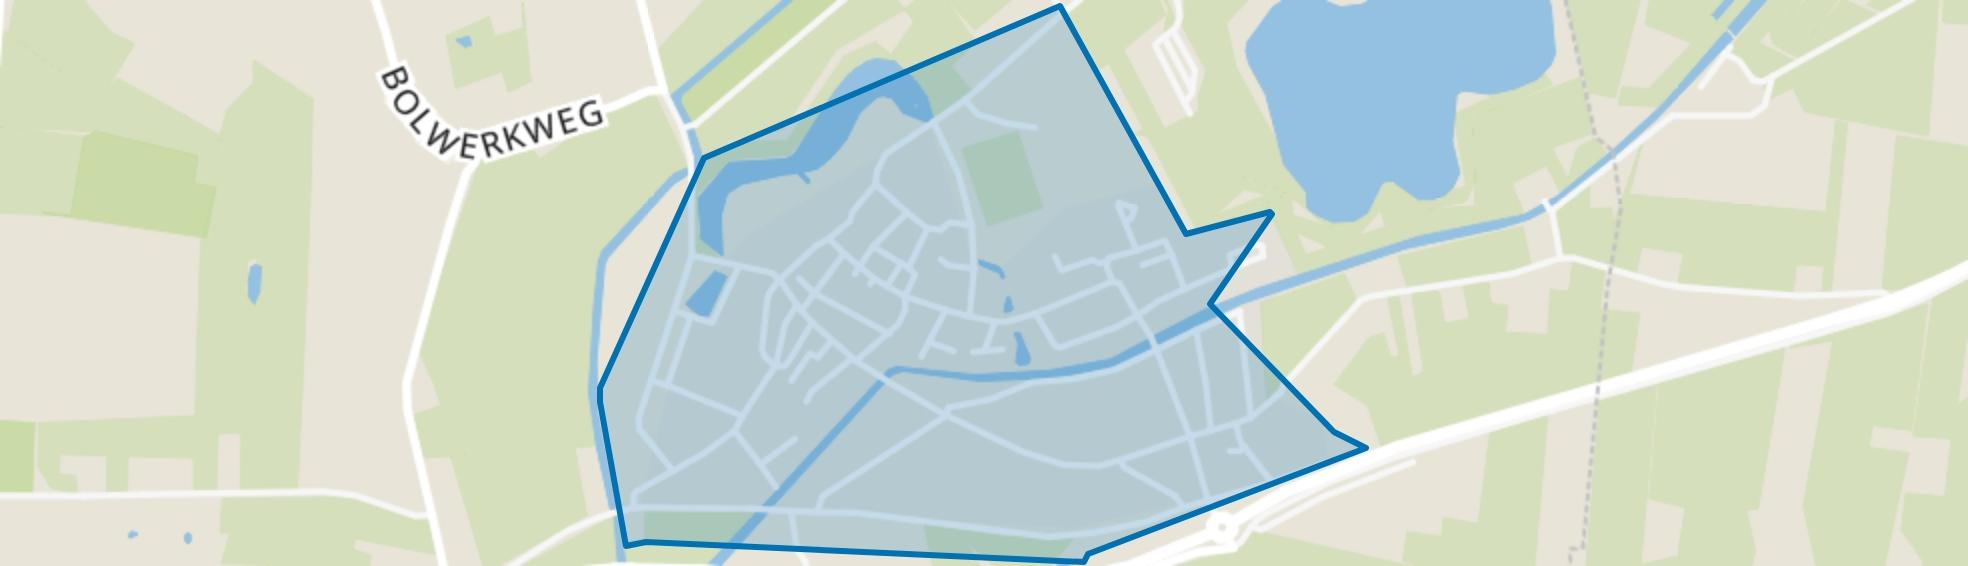 Bredevoort, Bredevoort map